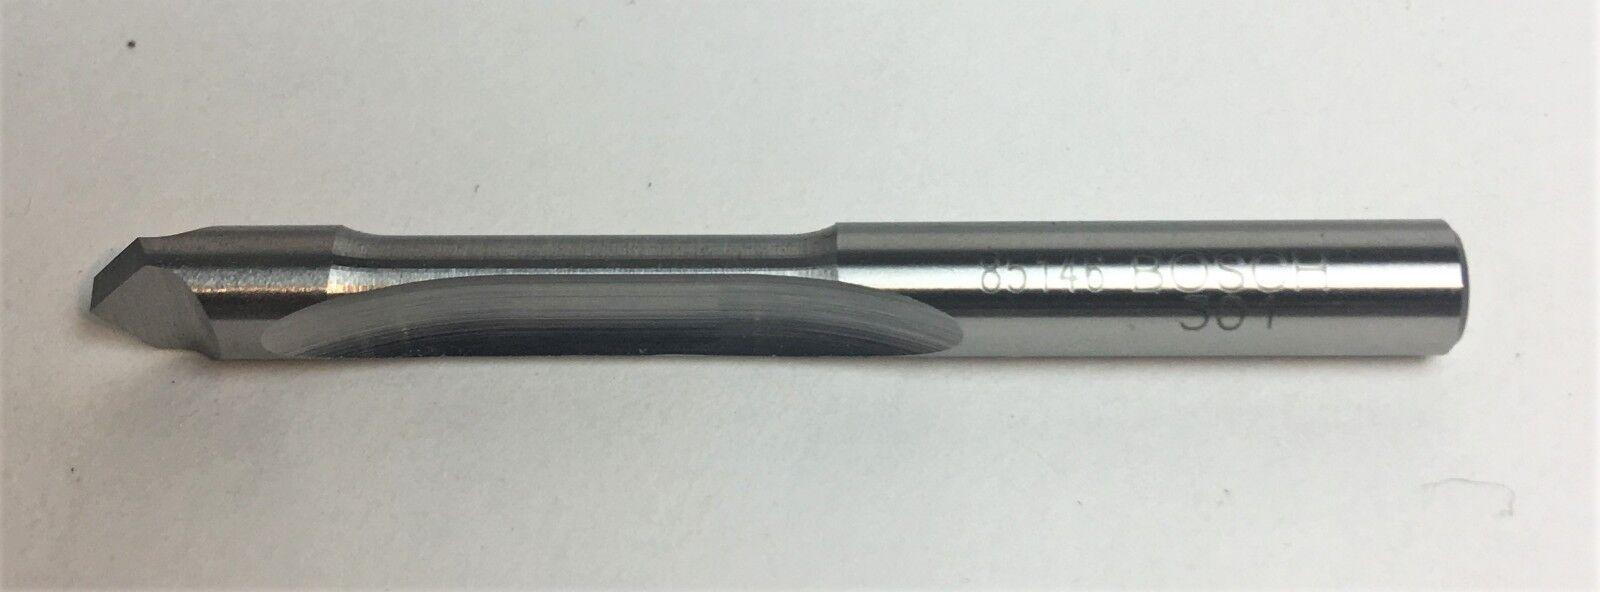 Bosch 85188 1//2-Inch High Speed Steel Pilot Panel Bit with Drill-through Point-Single Flute